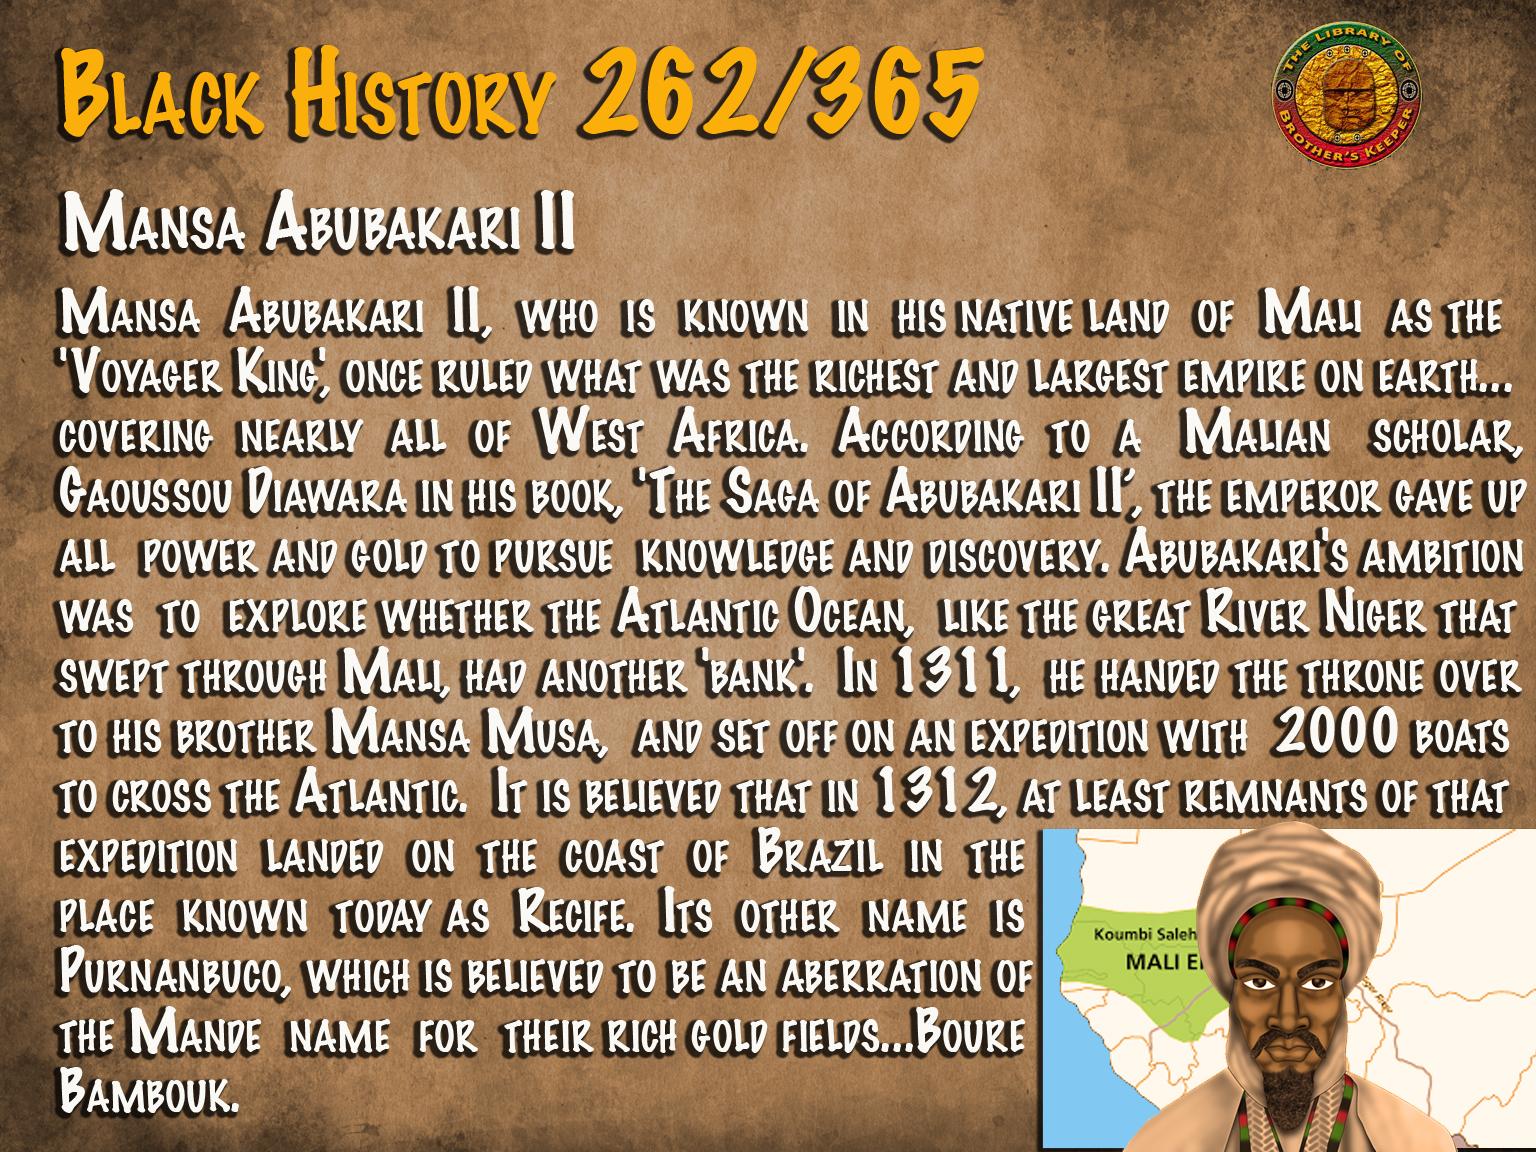 Mansa Abubakari II